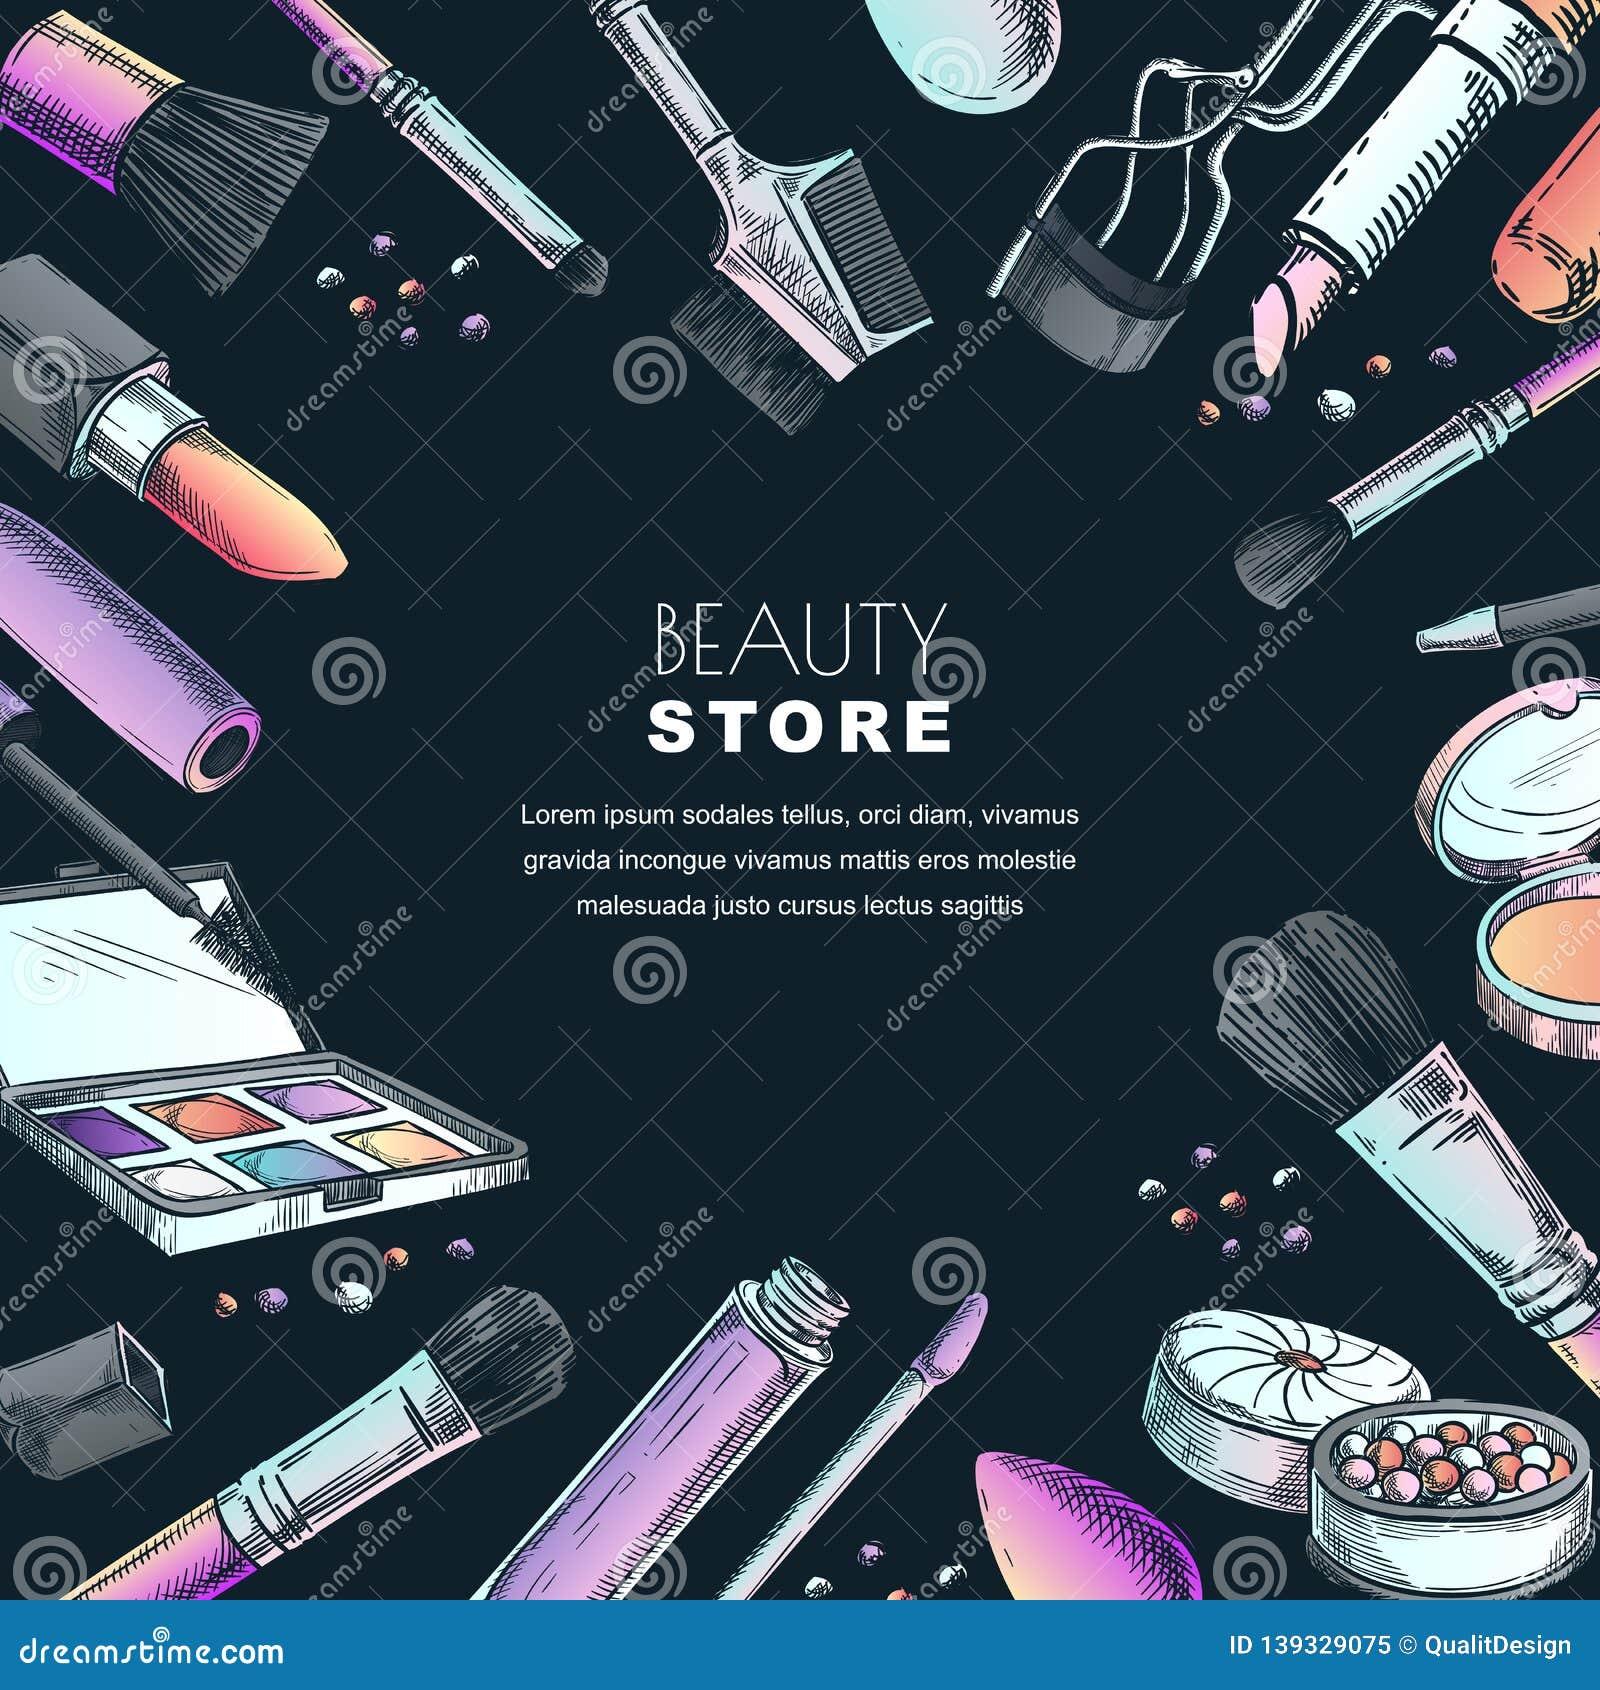 Makeup Banner Poster Or Label Design Template Sketch Illustration Of Facial Cosmetic Beauty Shop Background Stock Vector Illustration Of Eyelashes Doodle 139329075